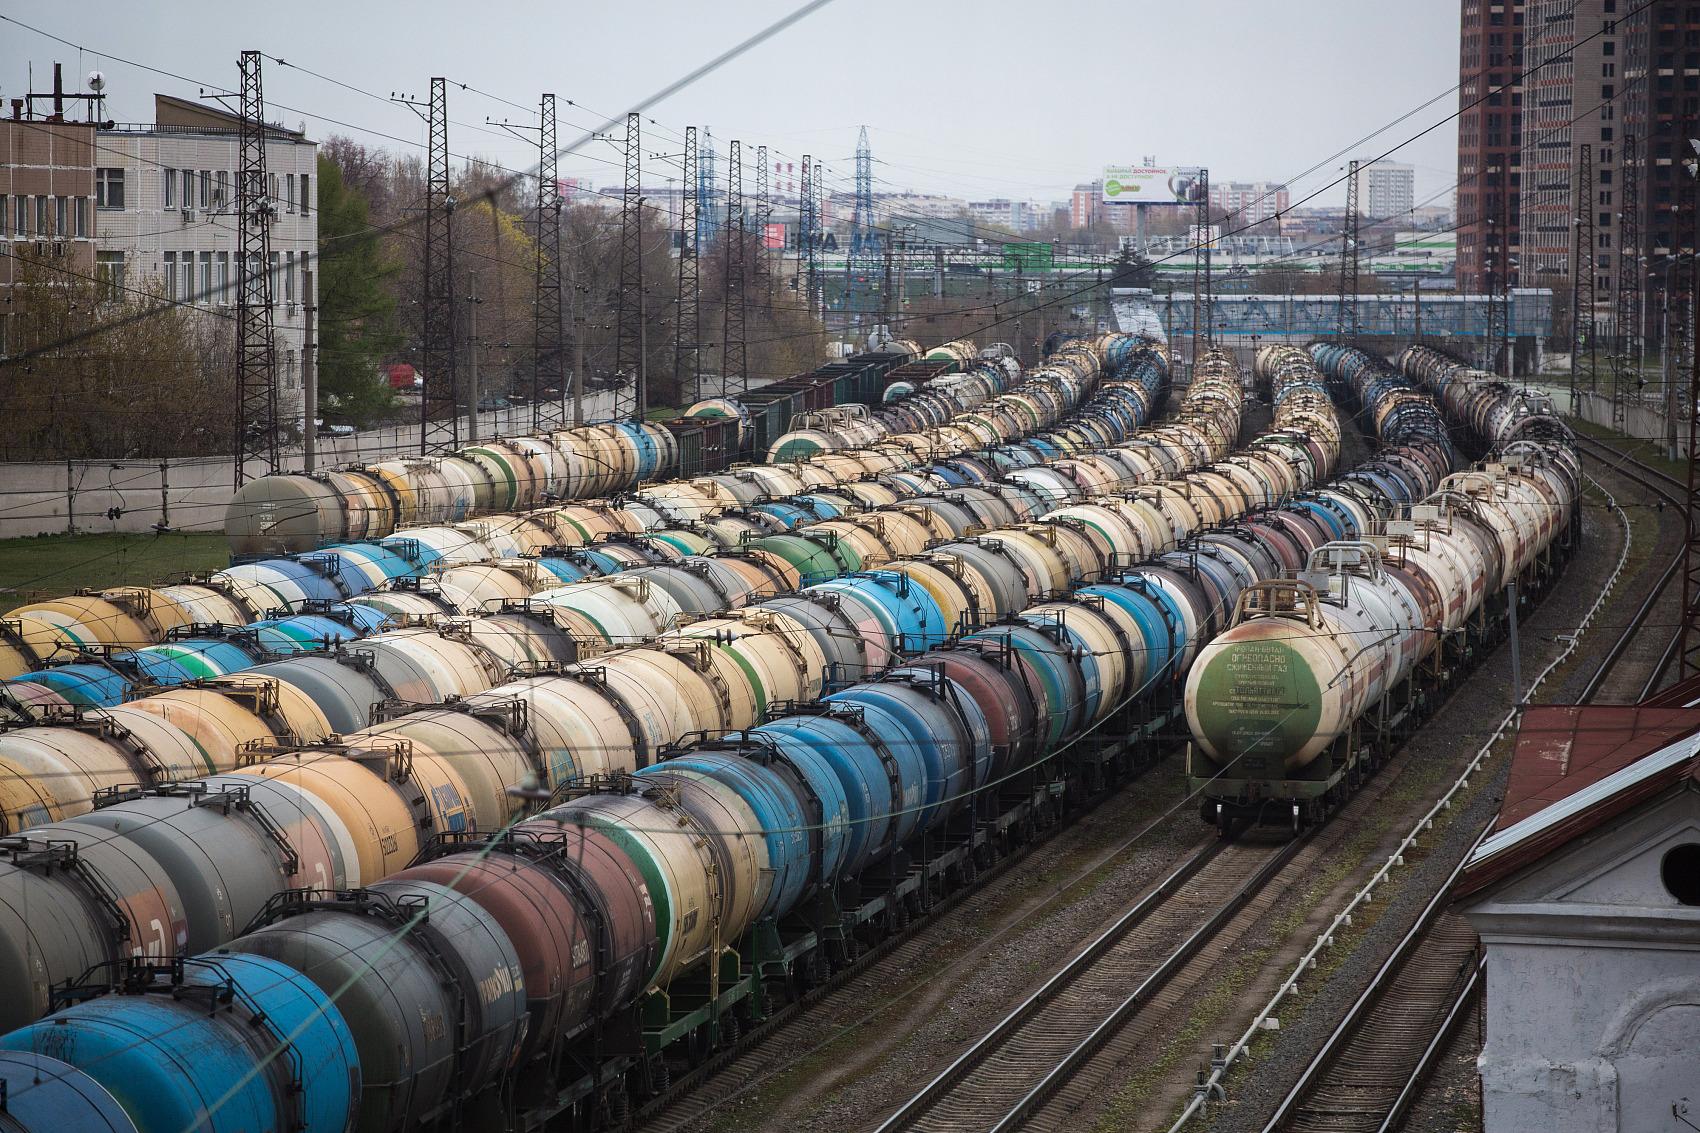 Global oil demand to decline by 9.1 mln barrels per day in 2020: OPEC